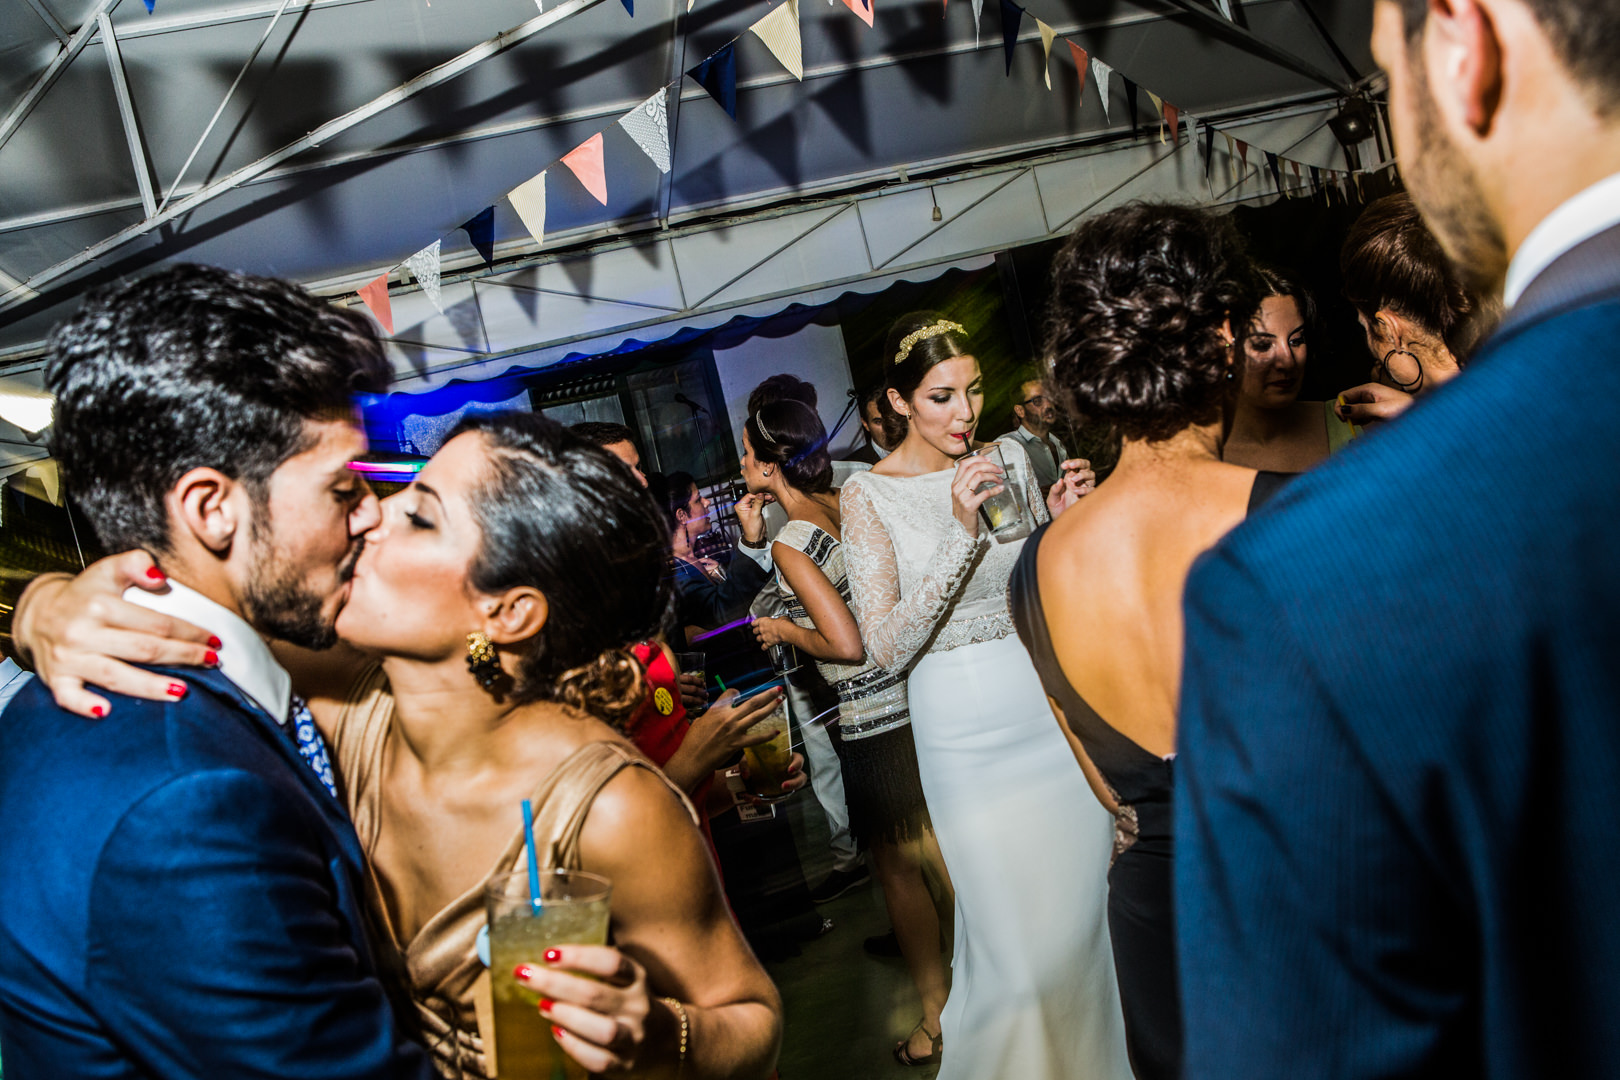 Boda-Sevilla-Museo-Carmona-Hamburgo-Maria-Carles-engagement-Rafael-Torres-fotografo-bodas-sevilla-madrid-barcelona-wedding-photographer--44.jpg